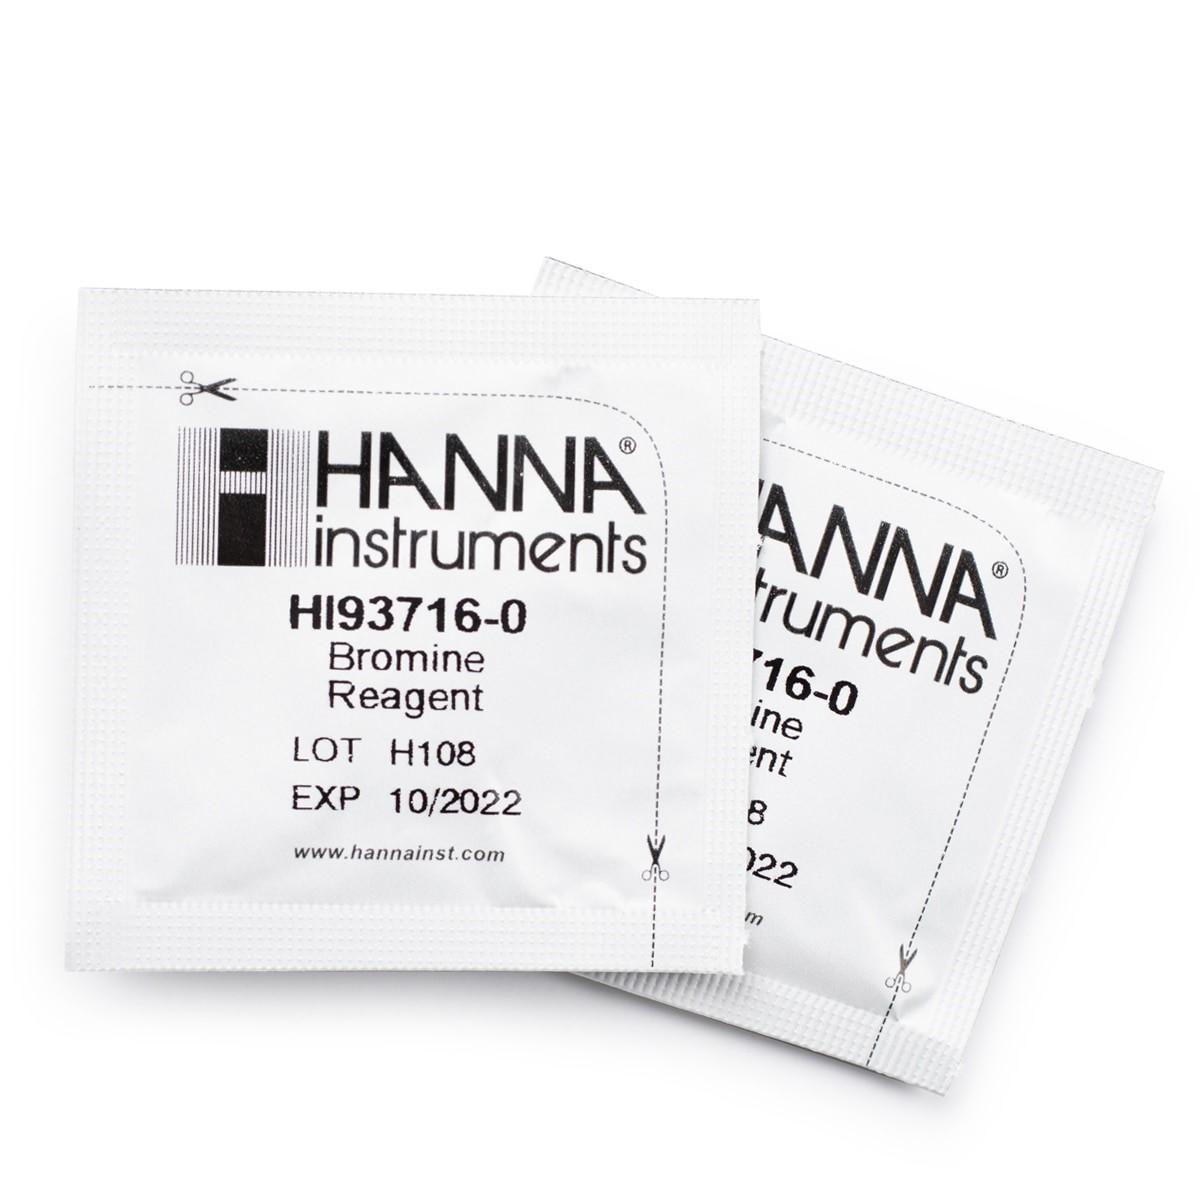 HI93716-03 Bromine Reagents (300 tests)